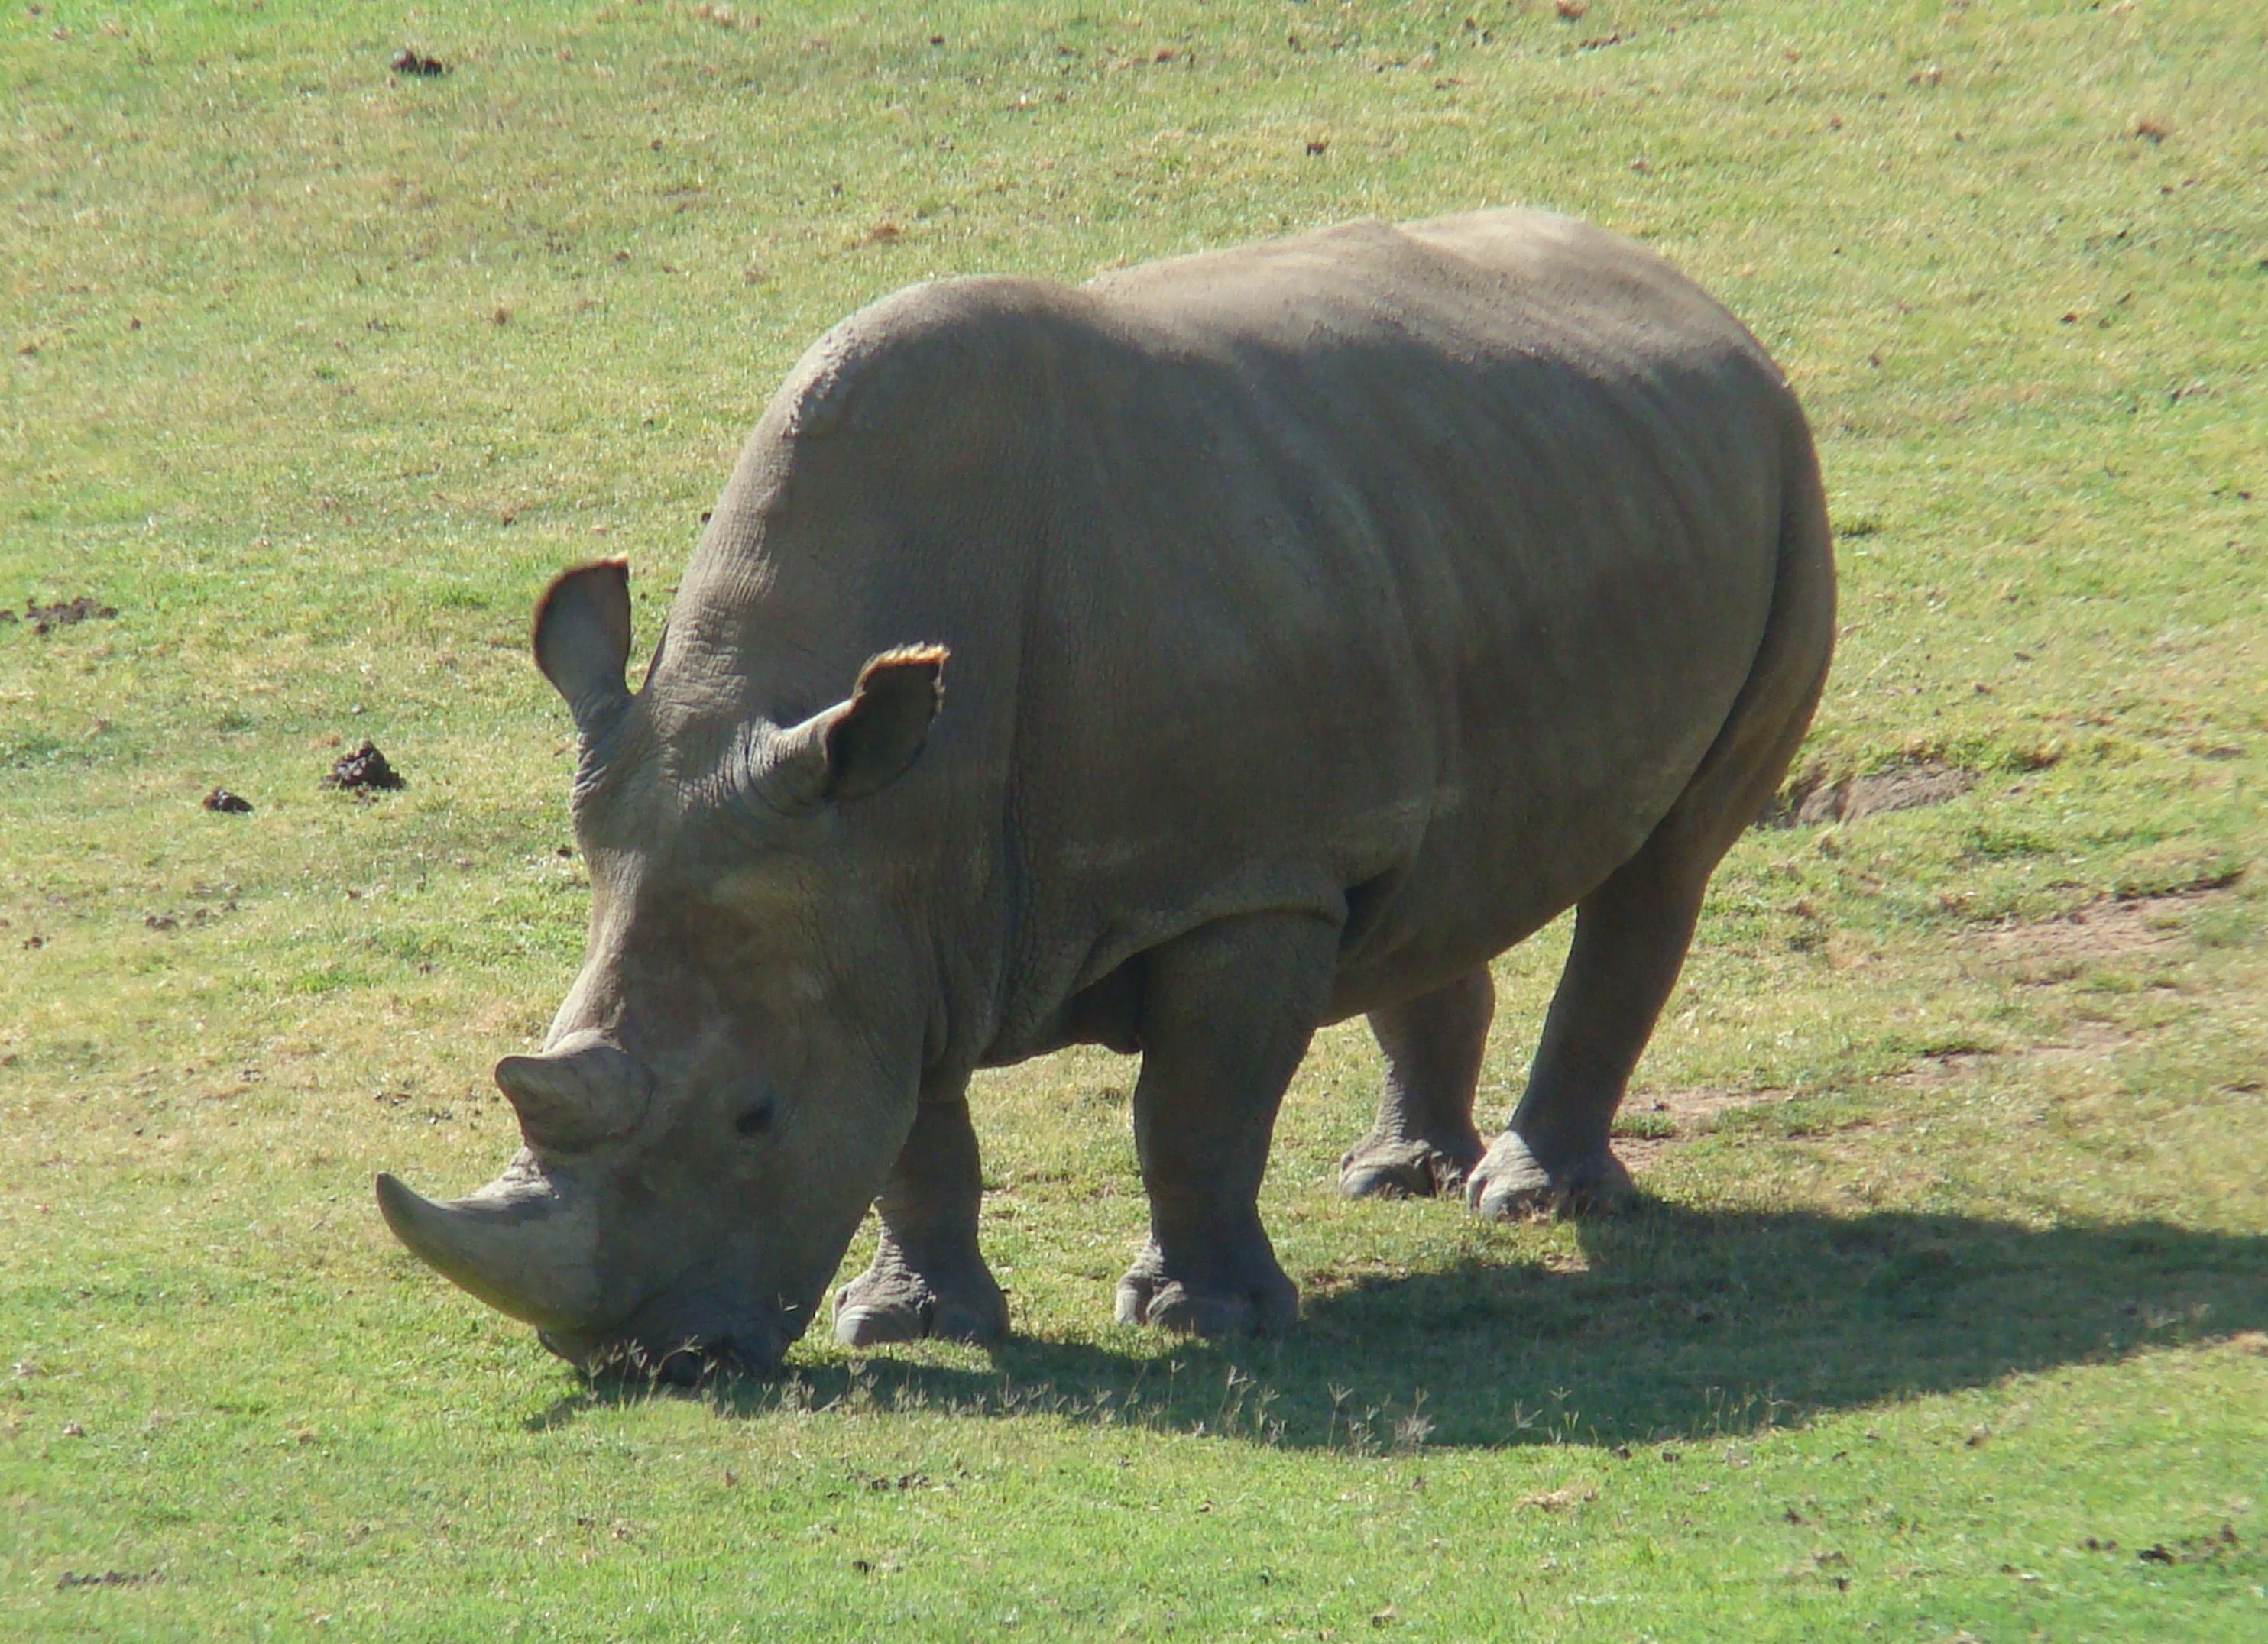 Northern white rhinoceros - Wikipedia